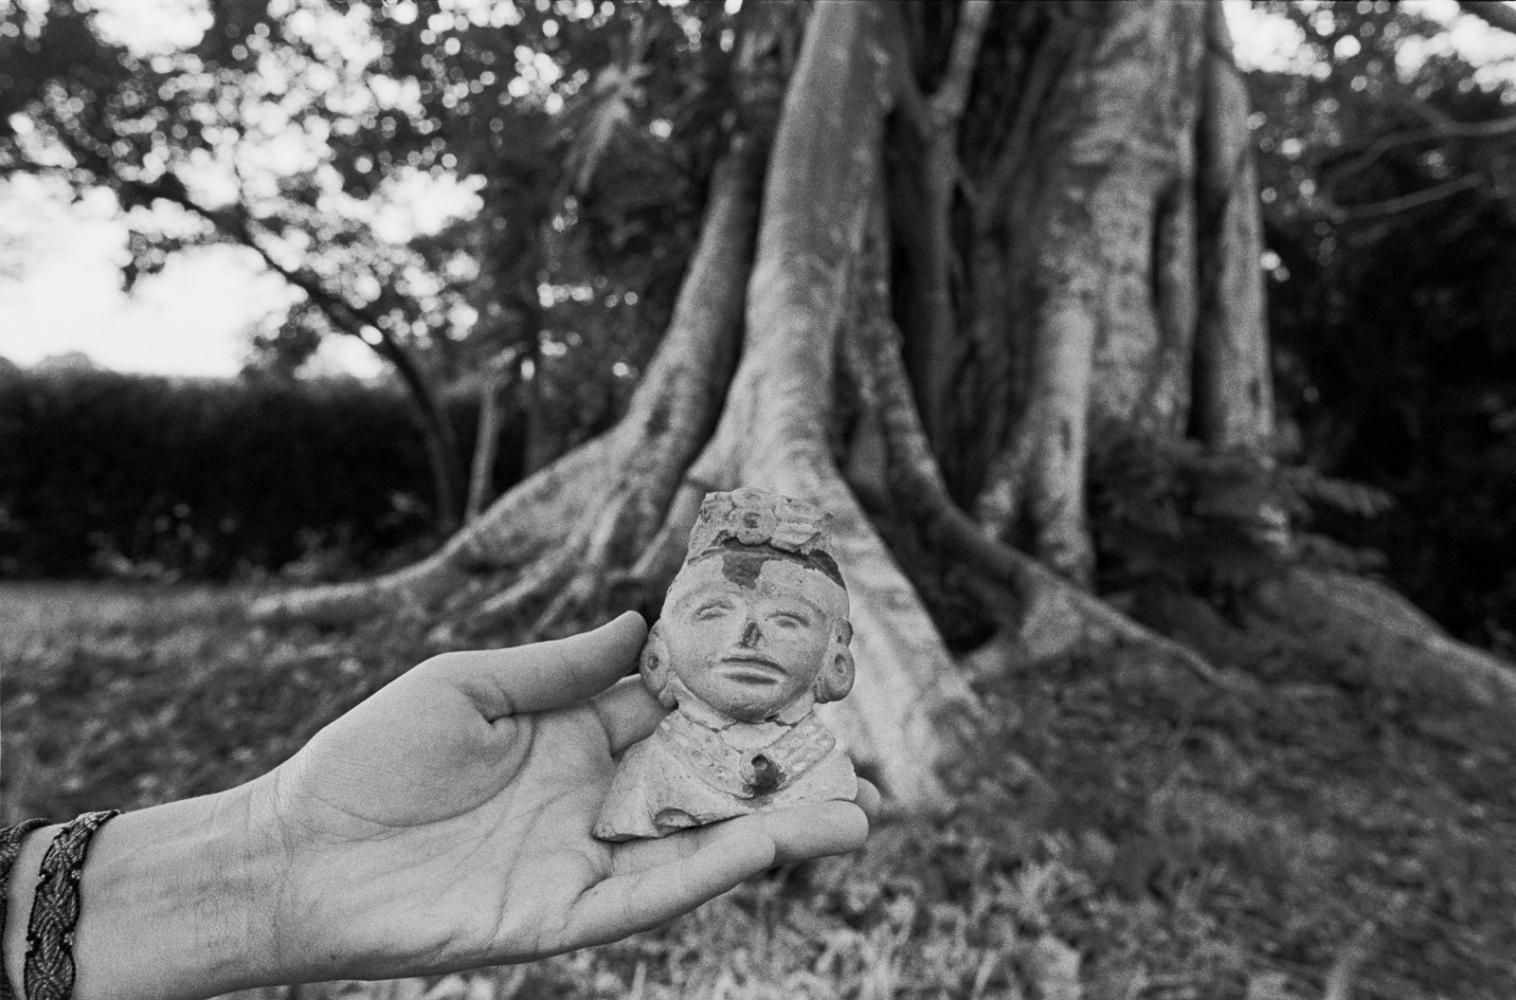 Art and Documentary Photography - Loading Las_Raices_Nat_sdeswaan.jpg